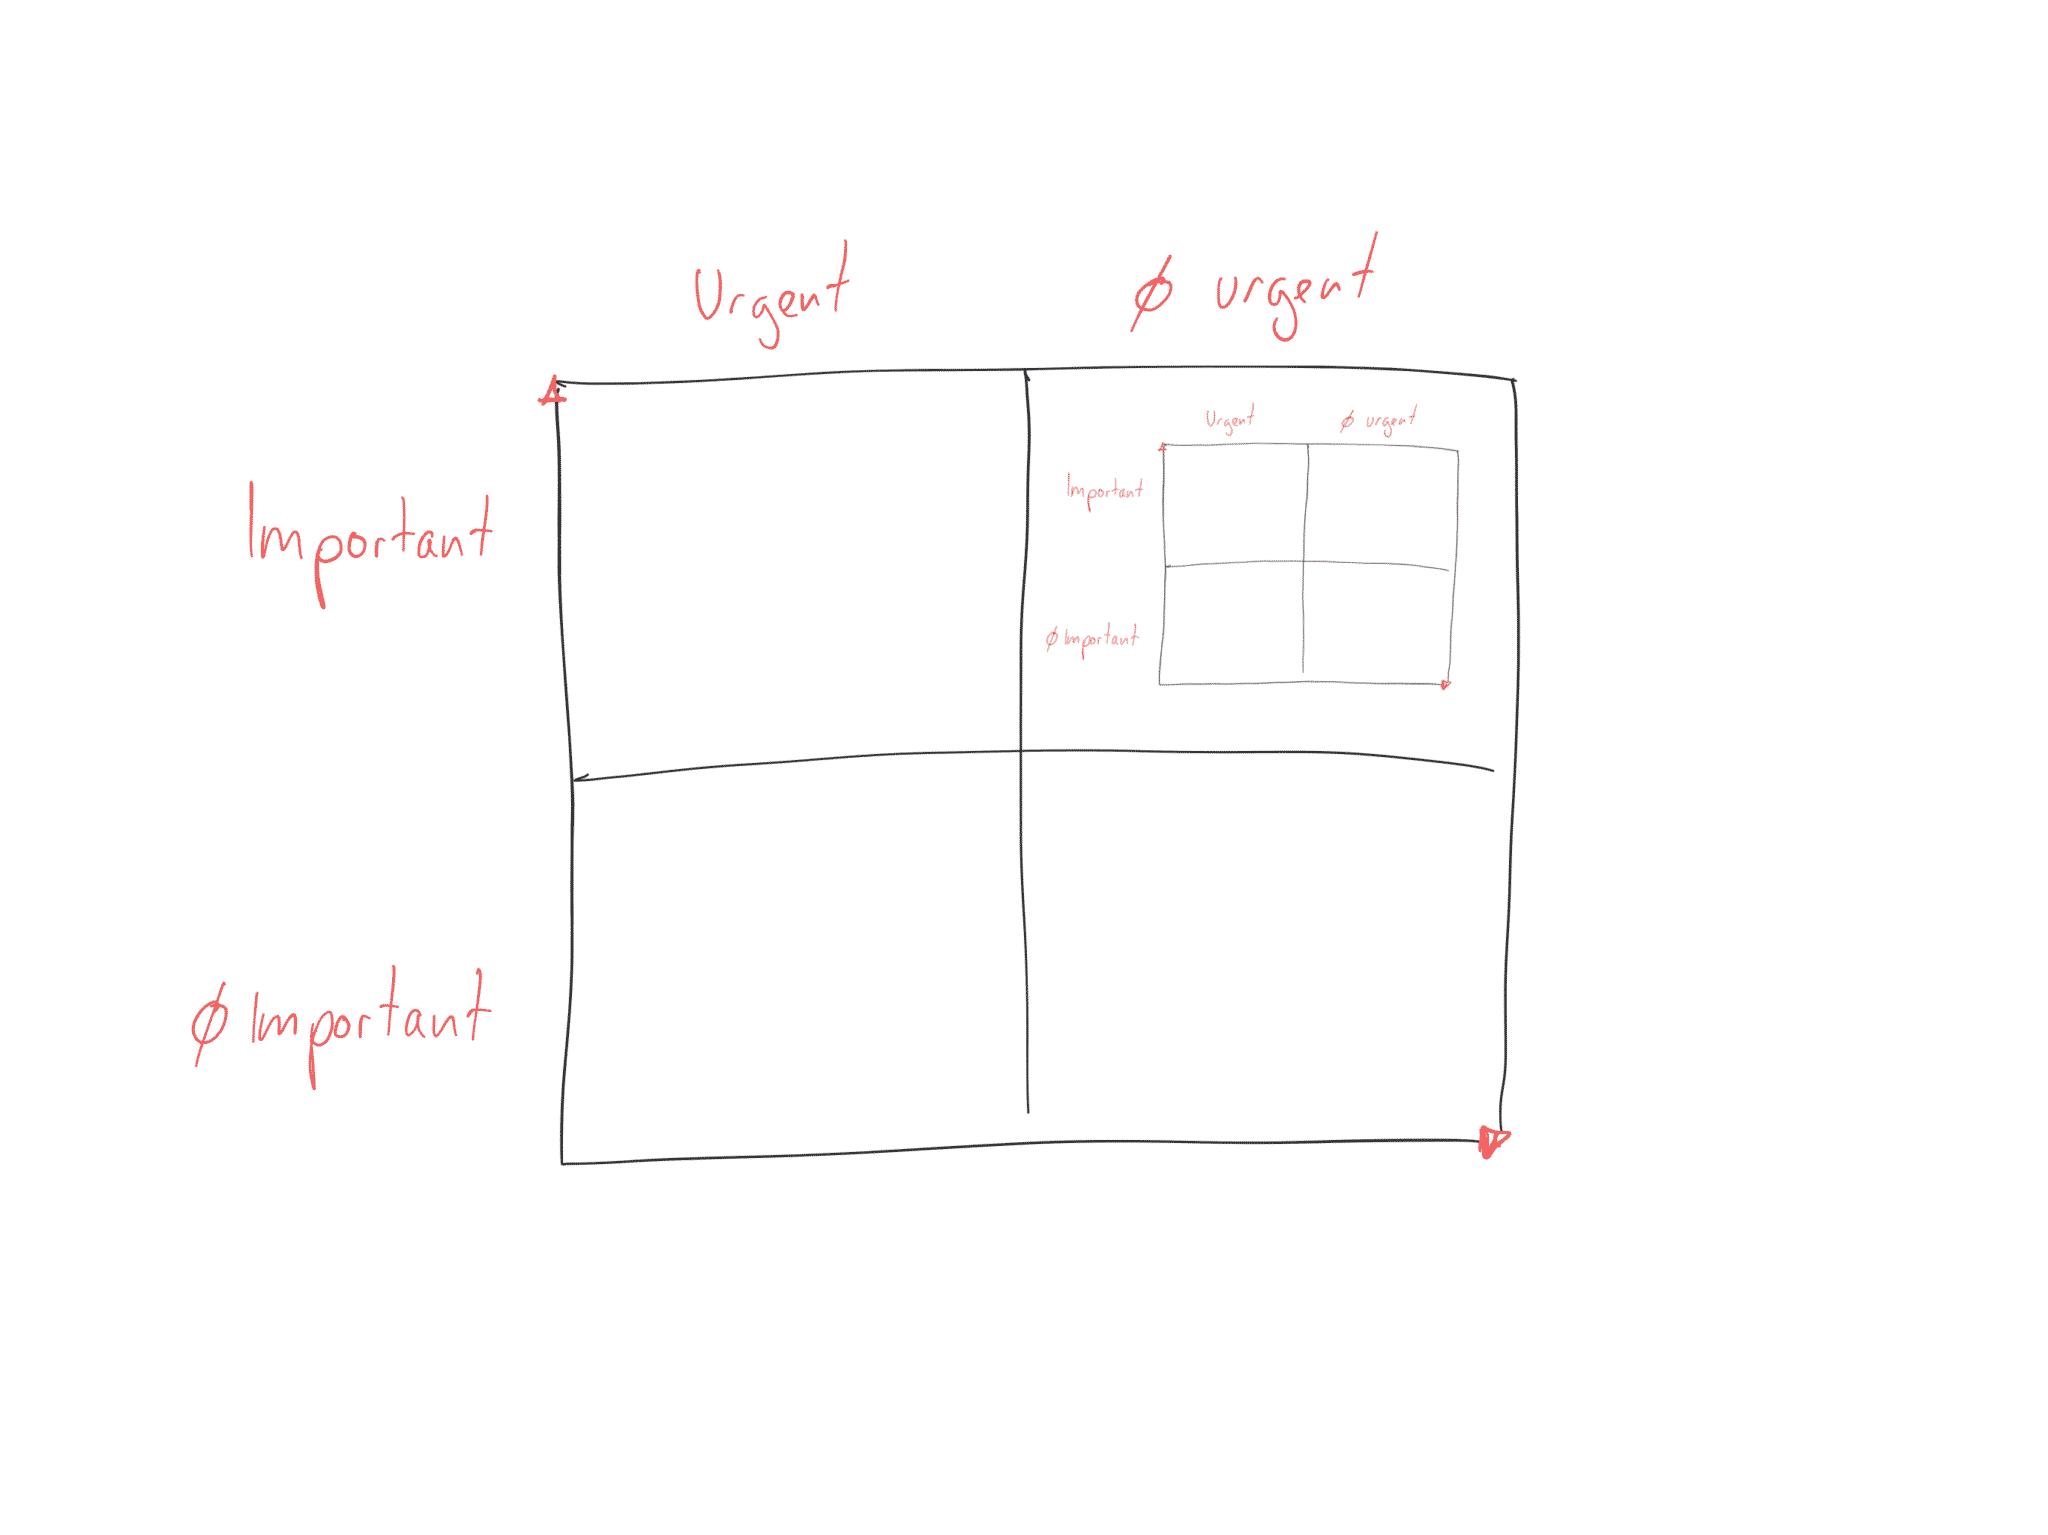 Une matrice dans la matrice